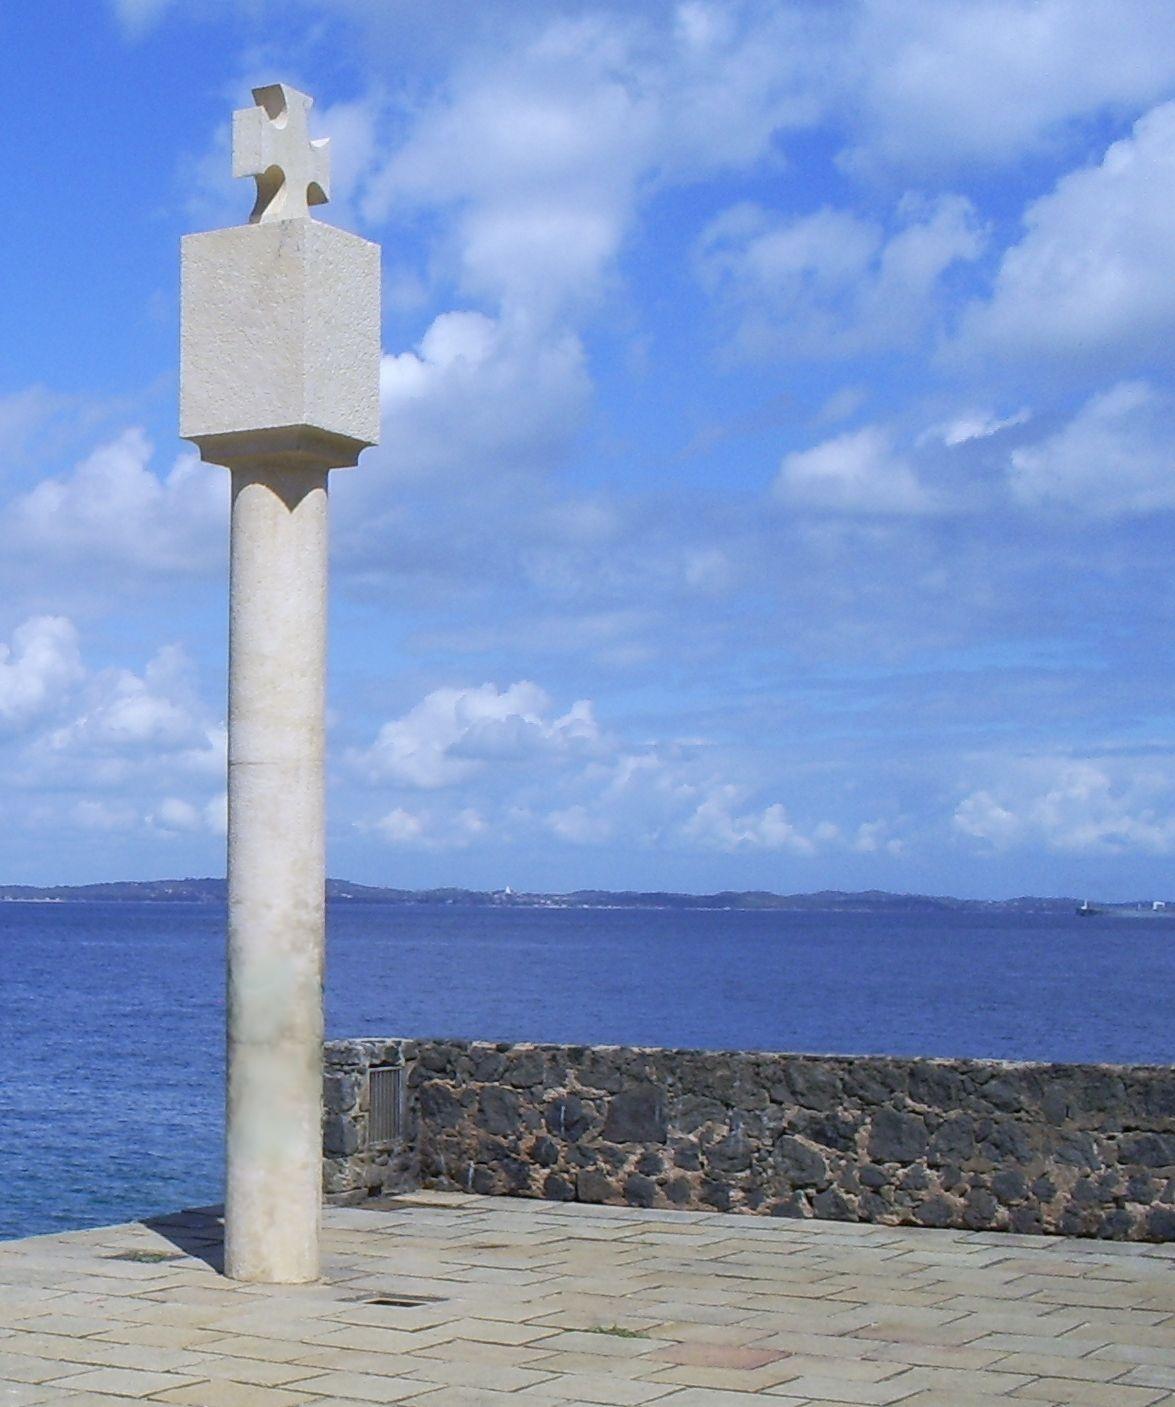 File:Salvador Bahia porto da barra marco.jpg - Wikimedia Commons